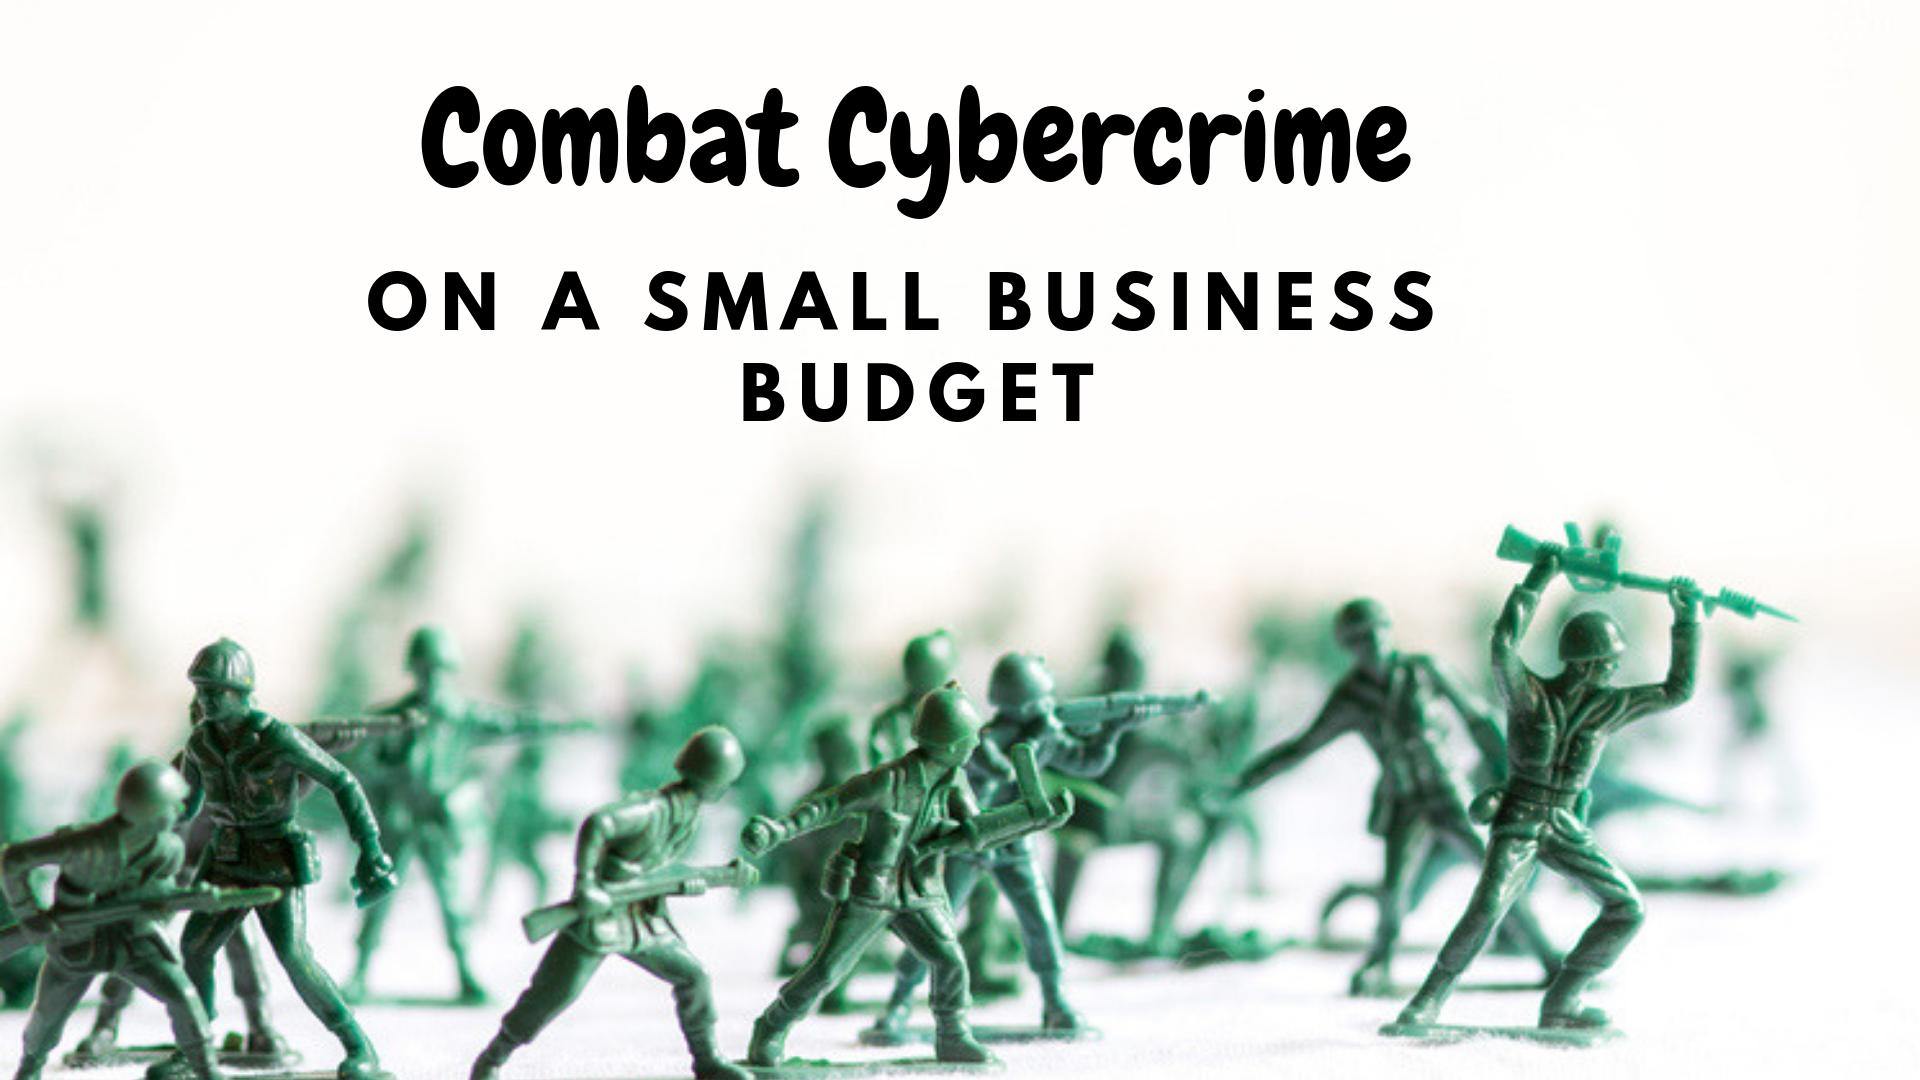 Combat Cybercrime